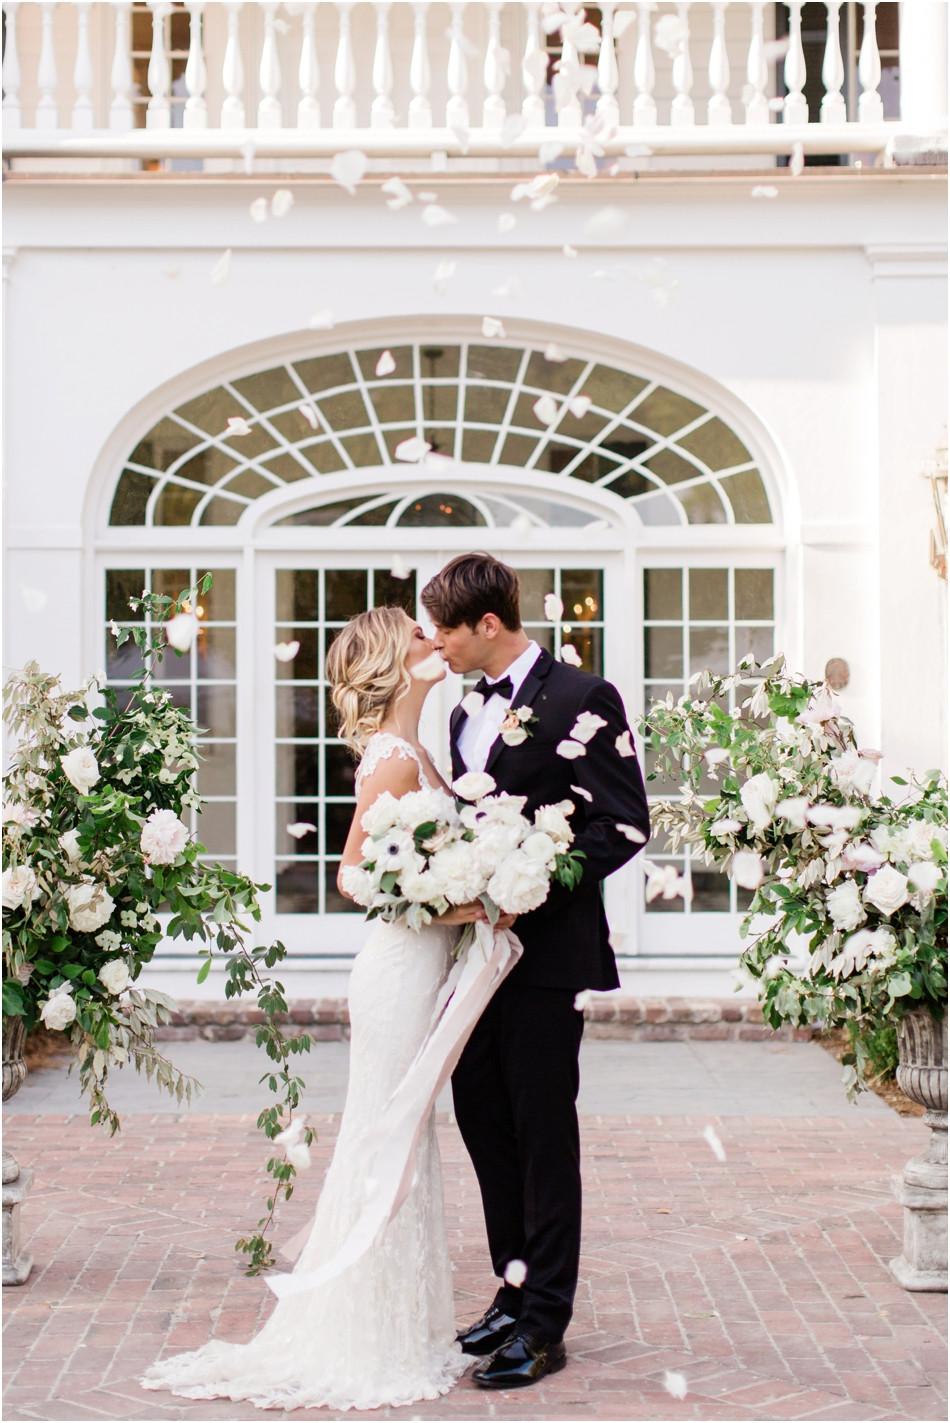 Charleston-wedding-ceremony-outside